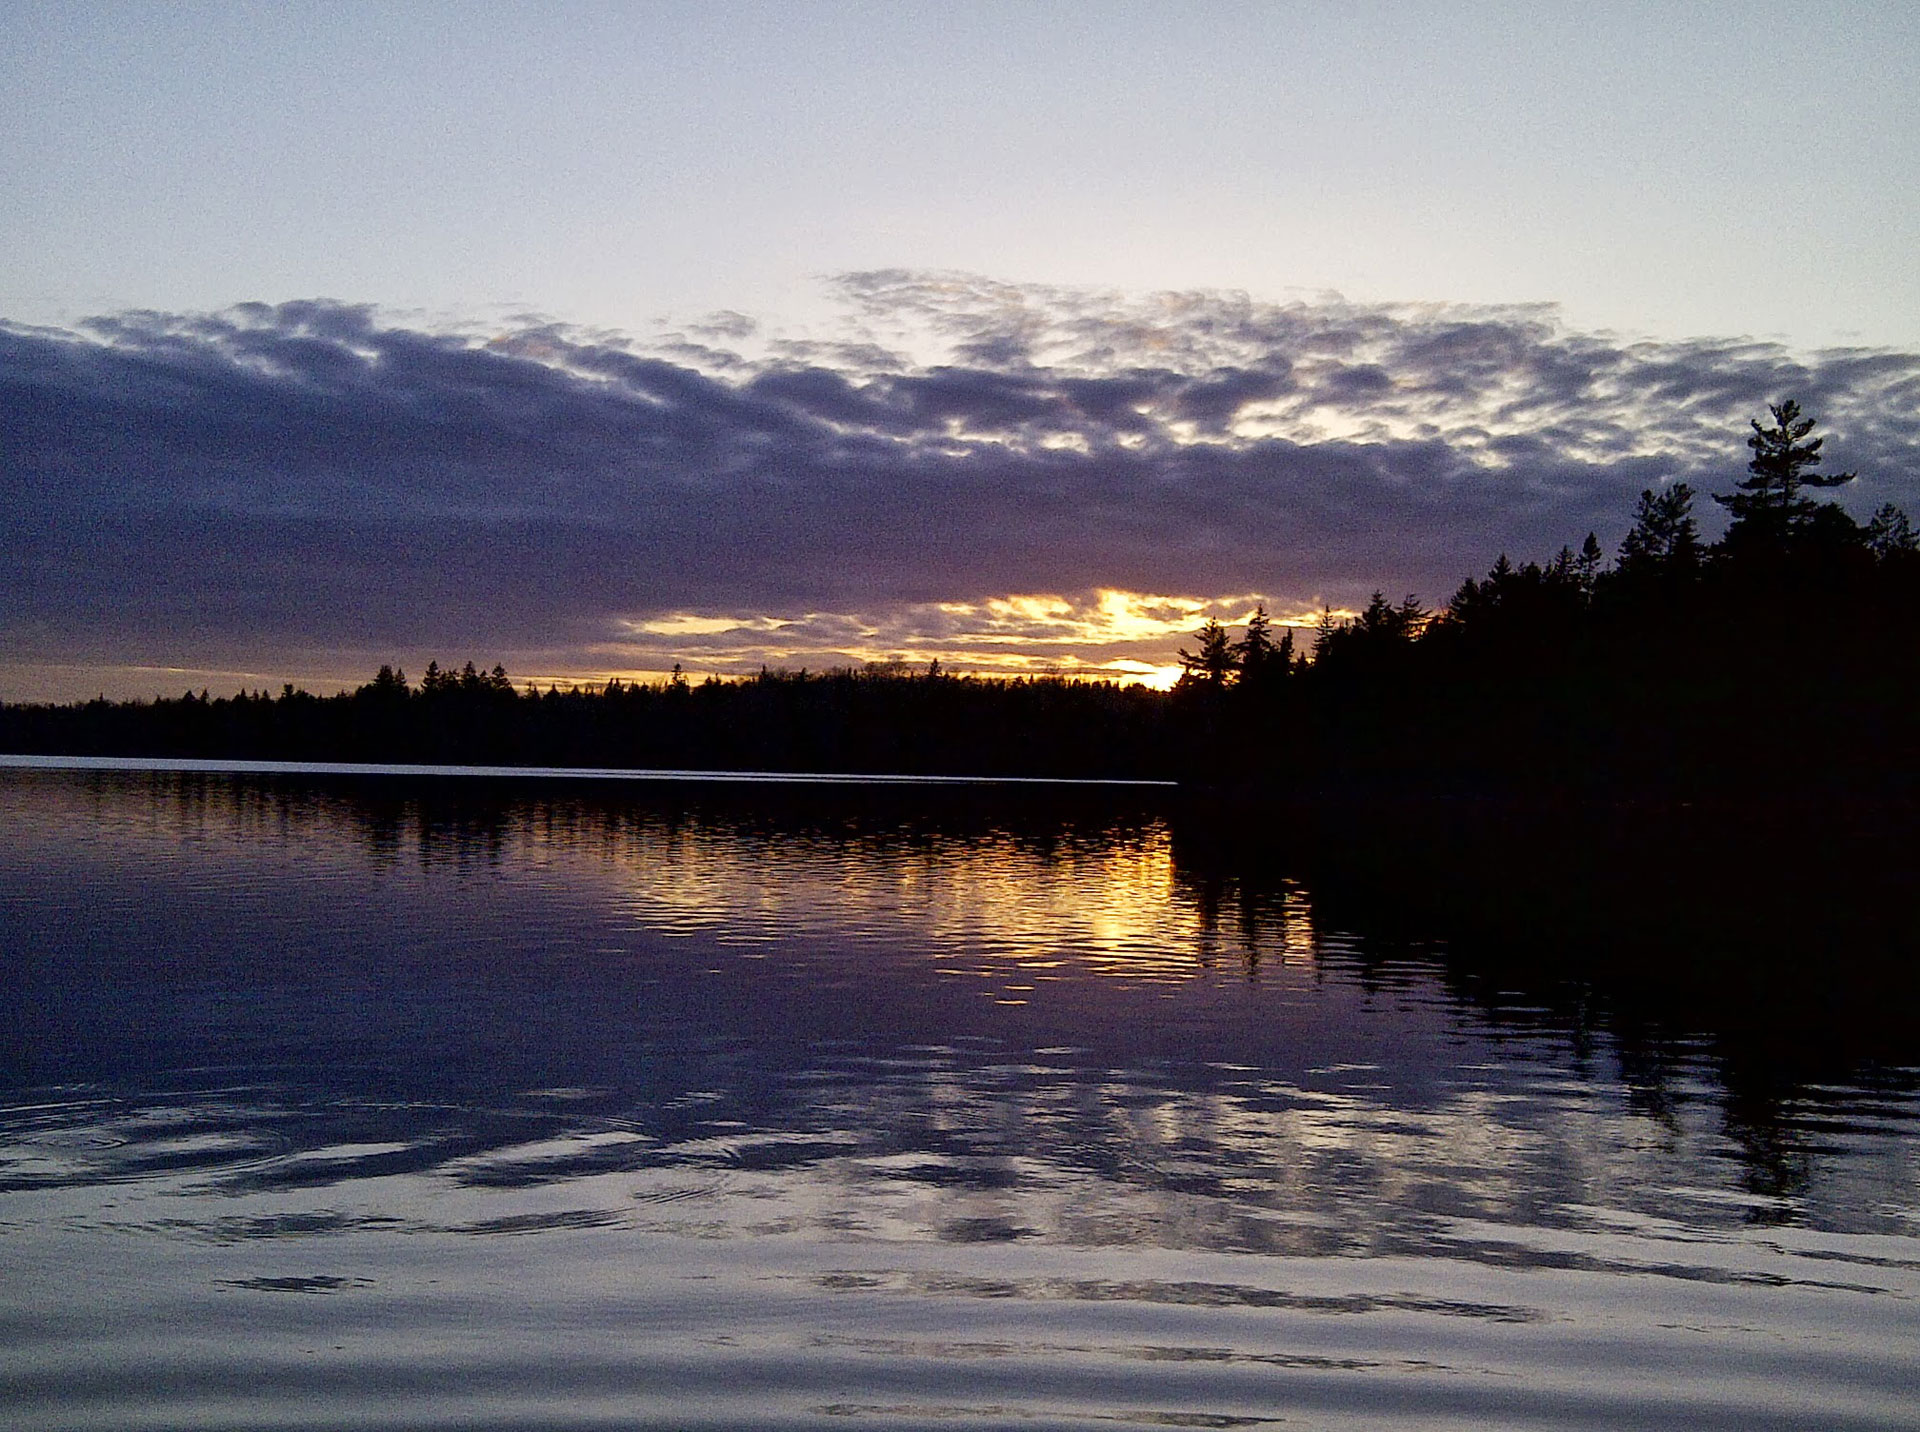 Card Lake Provincial Park